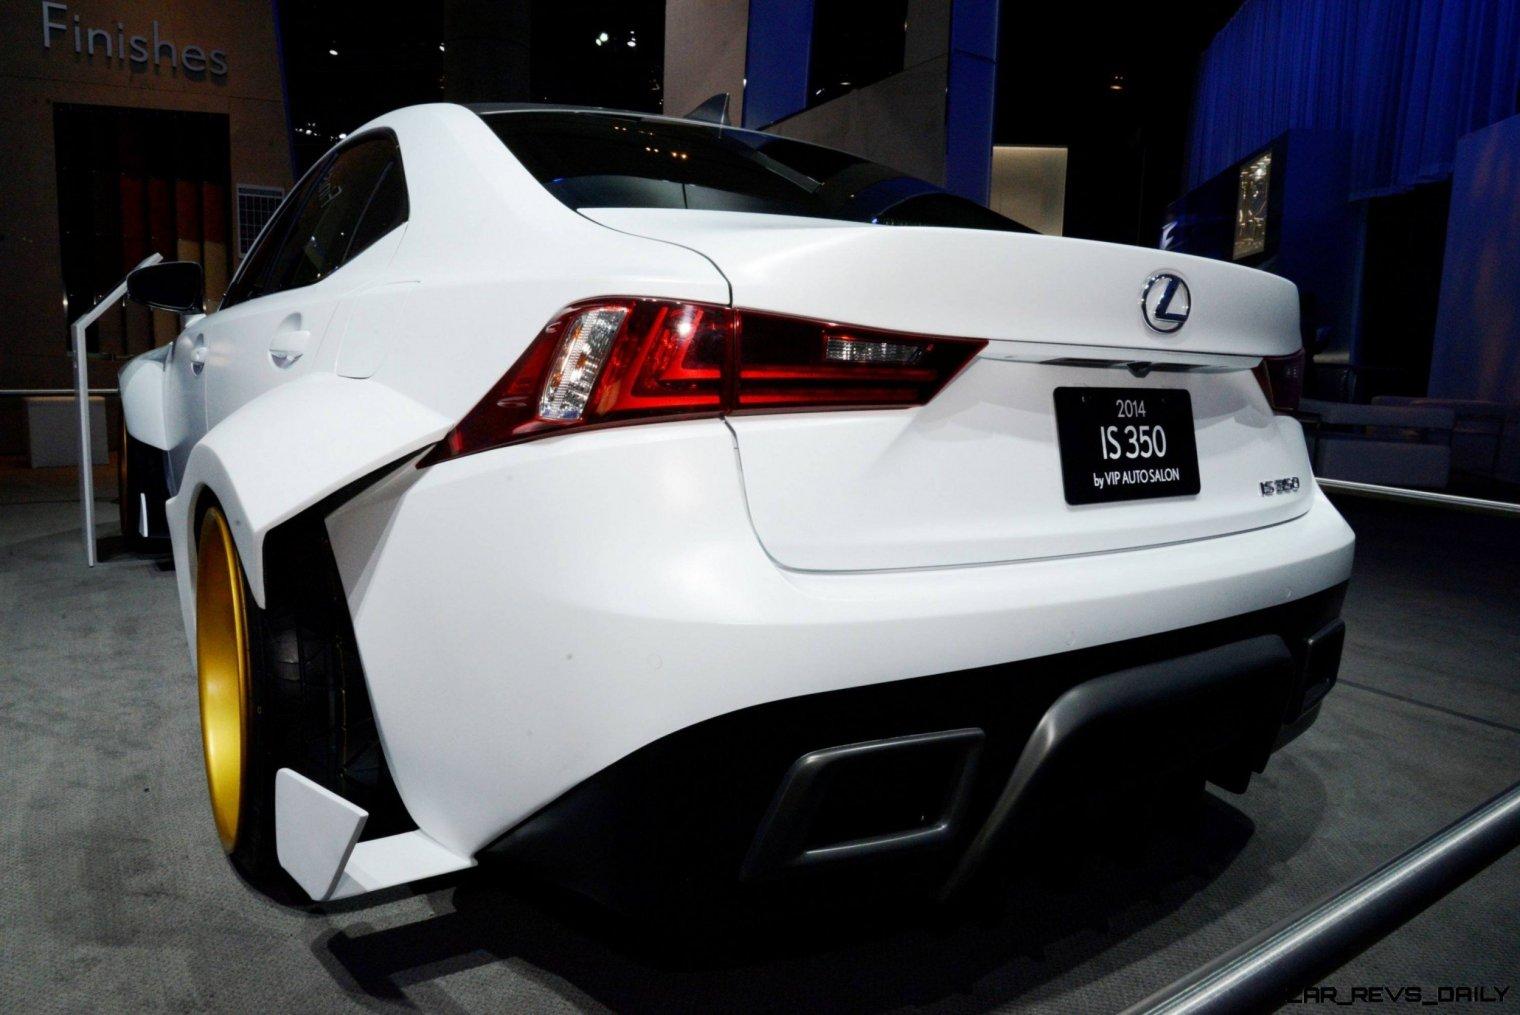 Car-Revs-Daily.com -- Lexus IS350FSport by Deviant ART is Best in Show SEMA 2013 16